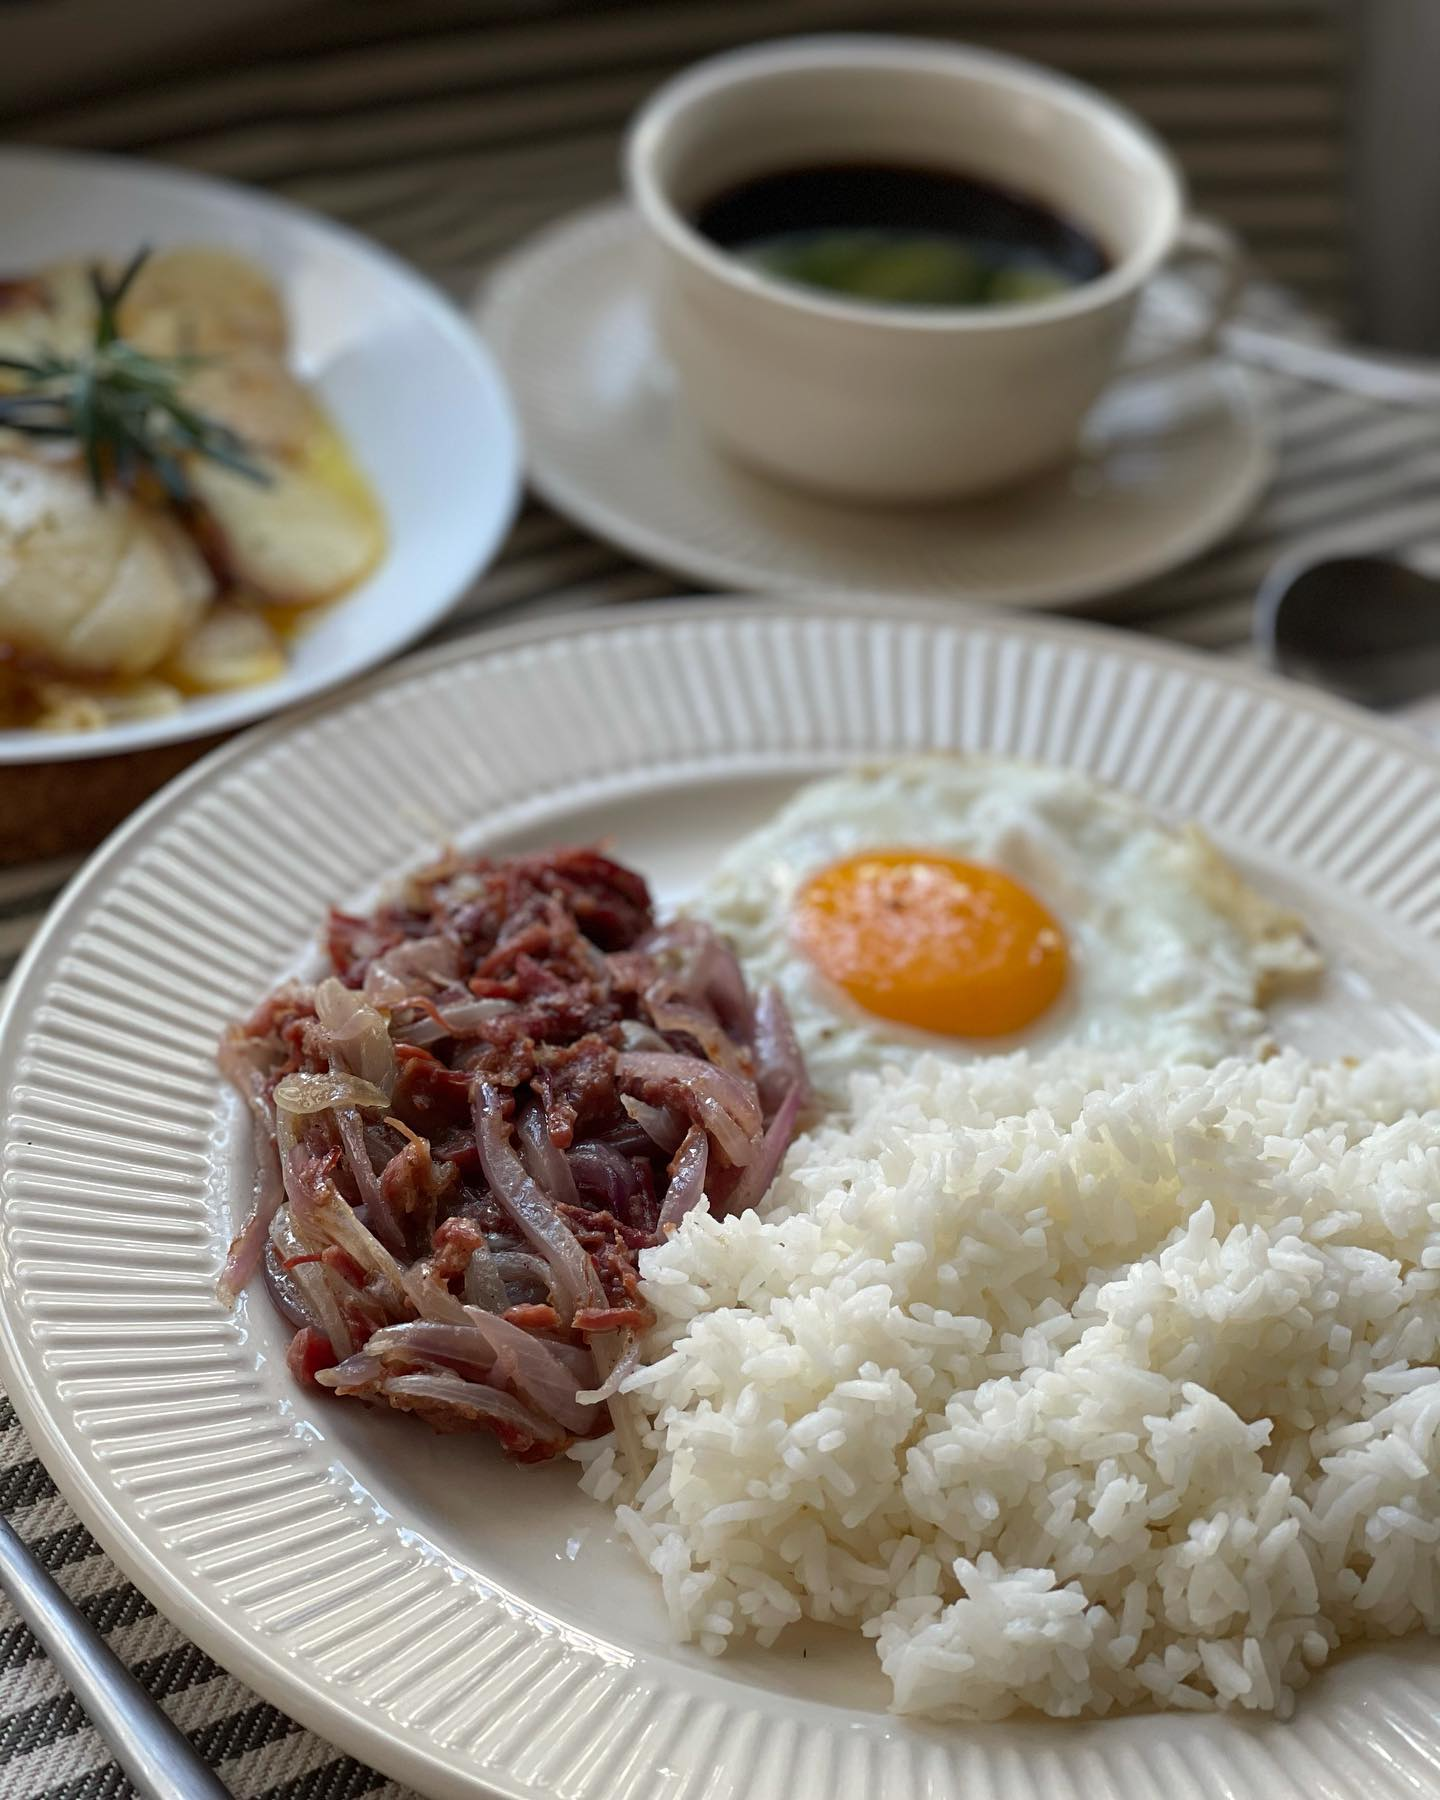 lassic Breakfast - Coffee, Egg and Corned Beef Onion Overload - House of Hazelknots